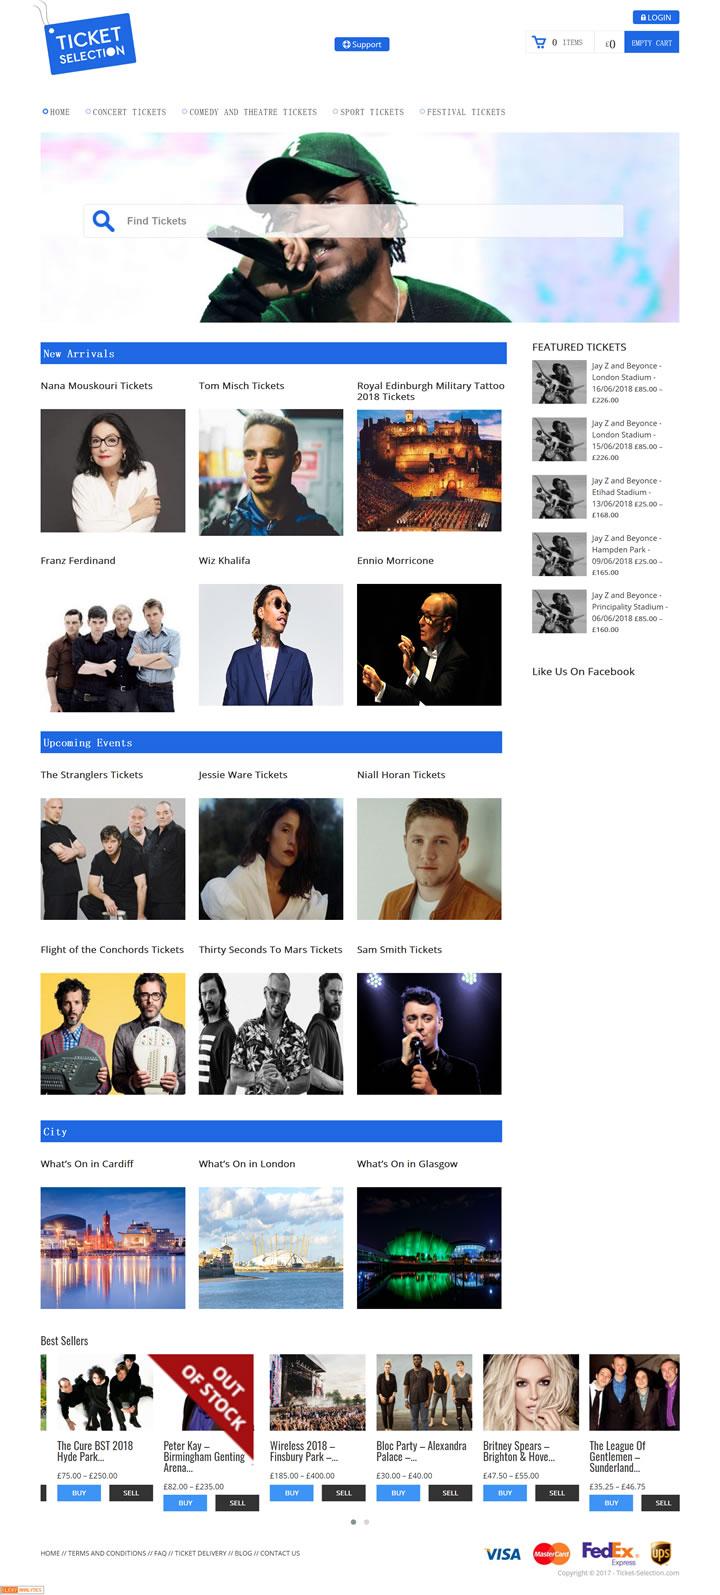 英国演唱会订票网站:Ticket Selection